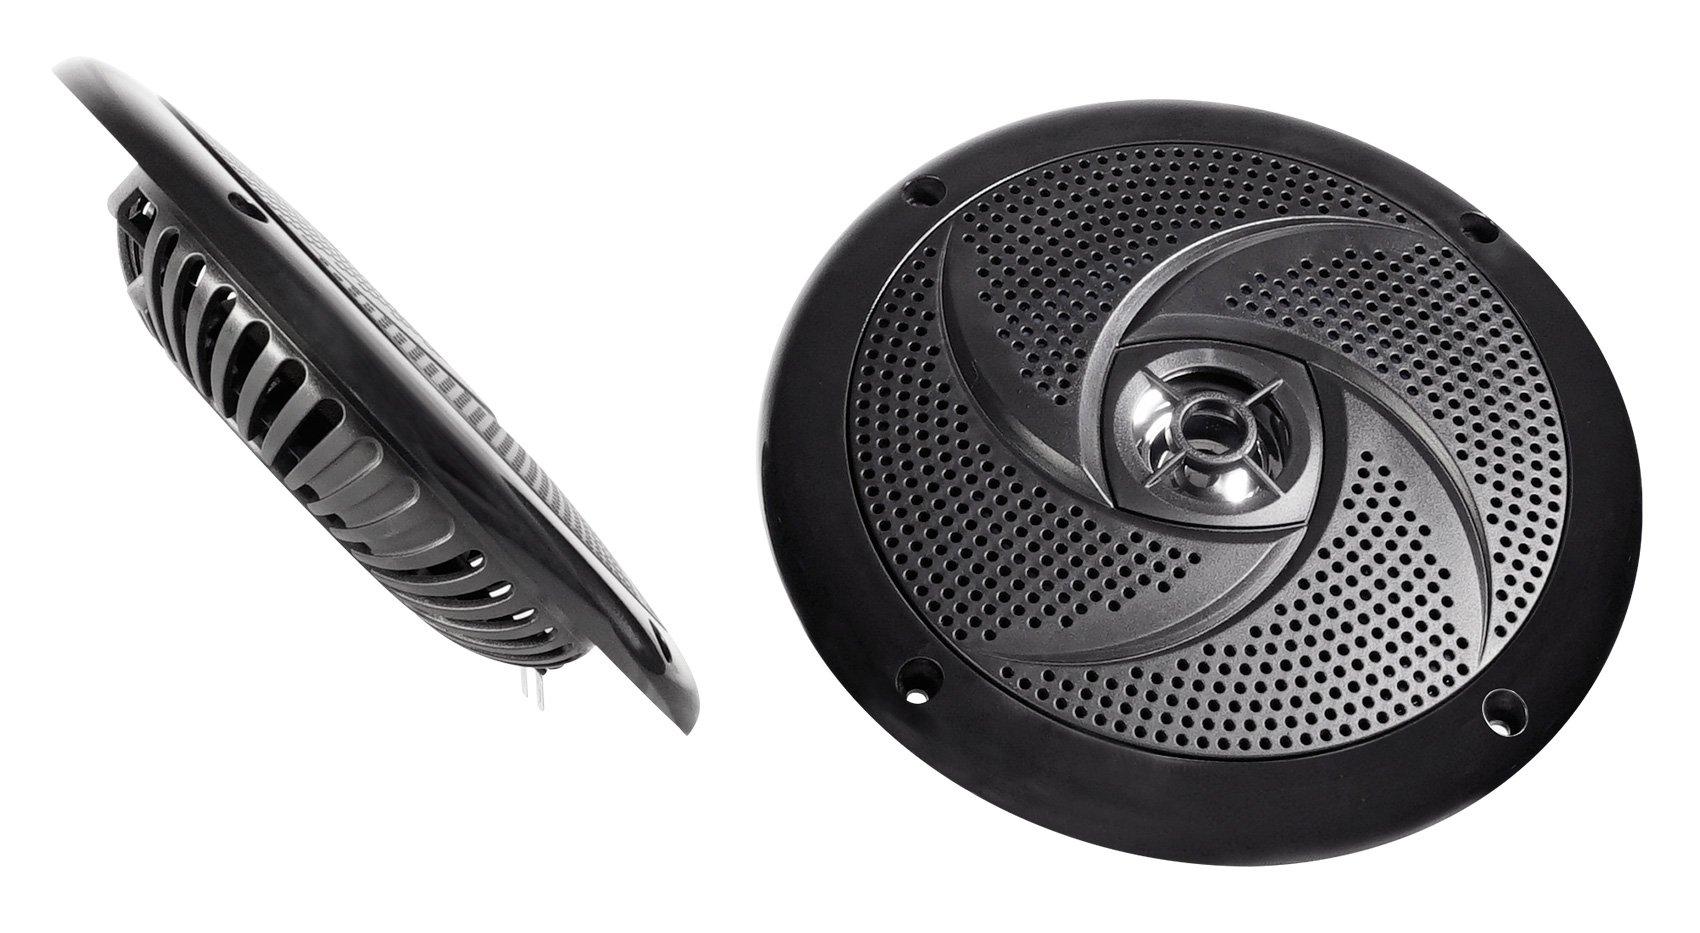 2 Rockville RSM65B 6.5'' 320w Waterproof Shallow Slim Speakers 4 RZR/ATV/UTV/Cart by Rockville (Image #3)